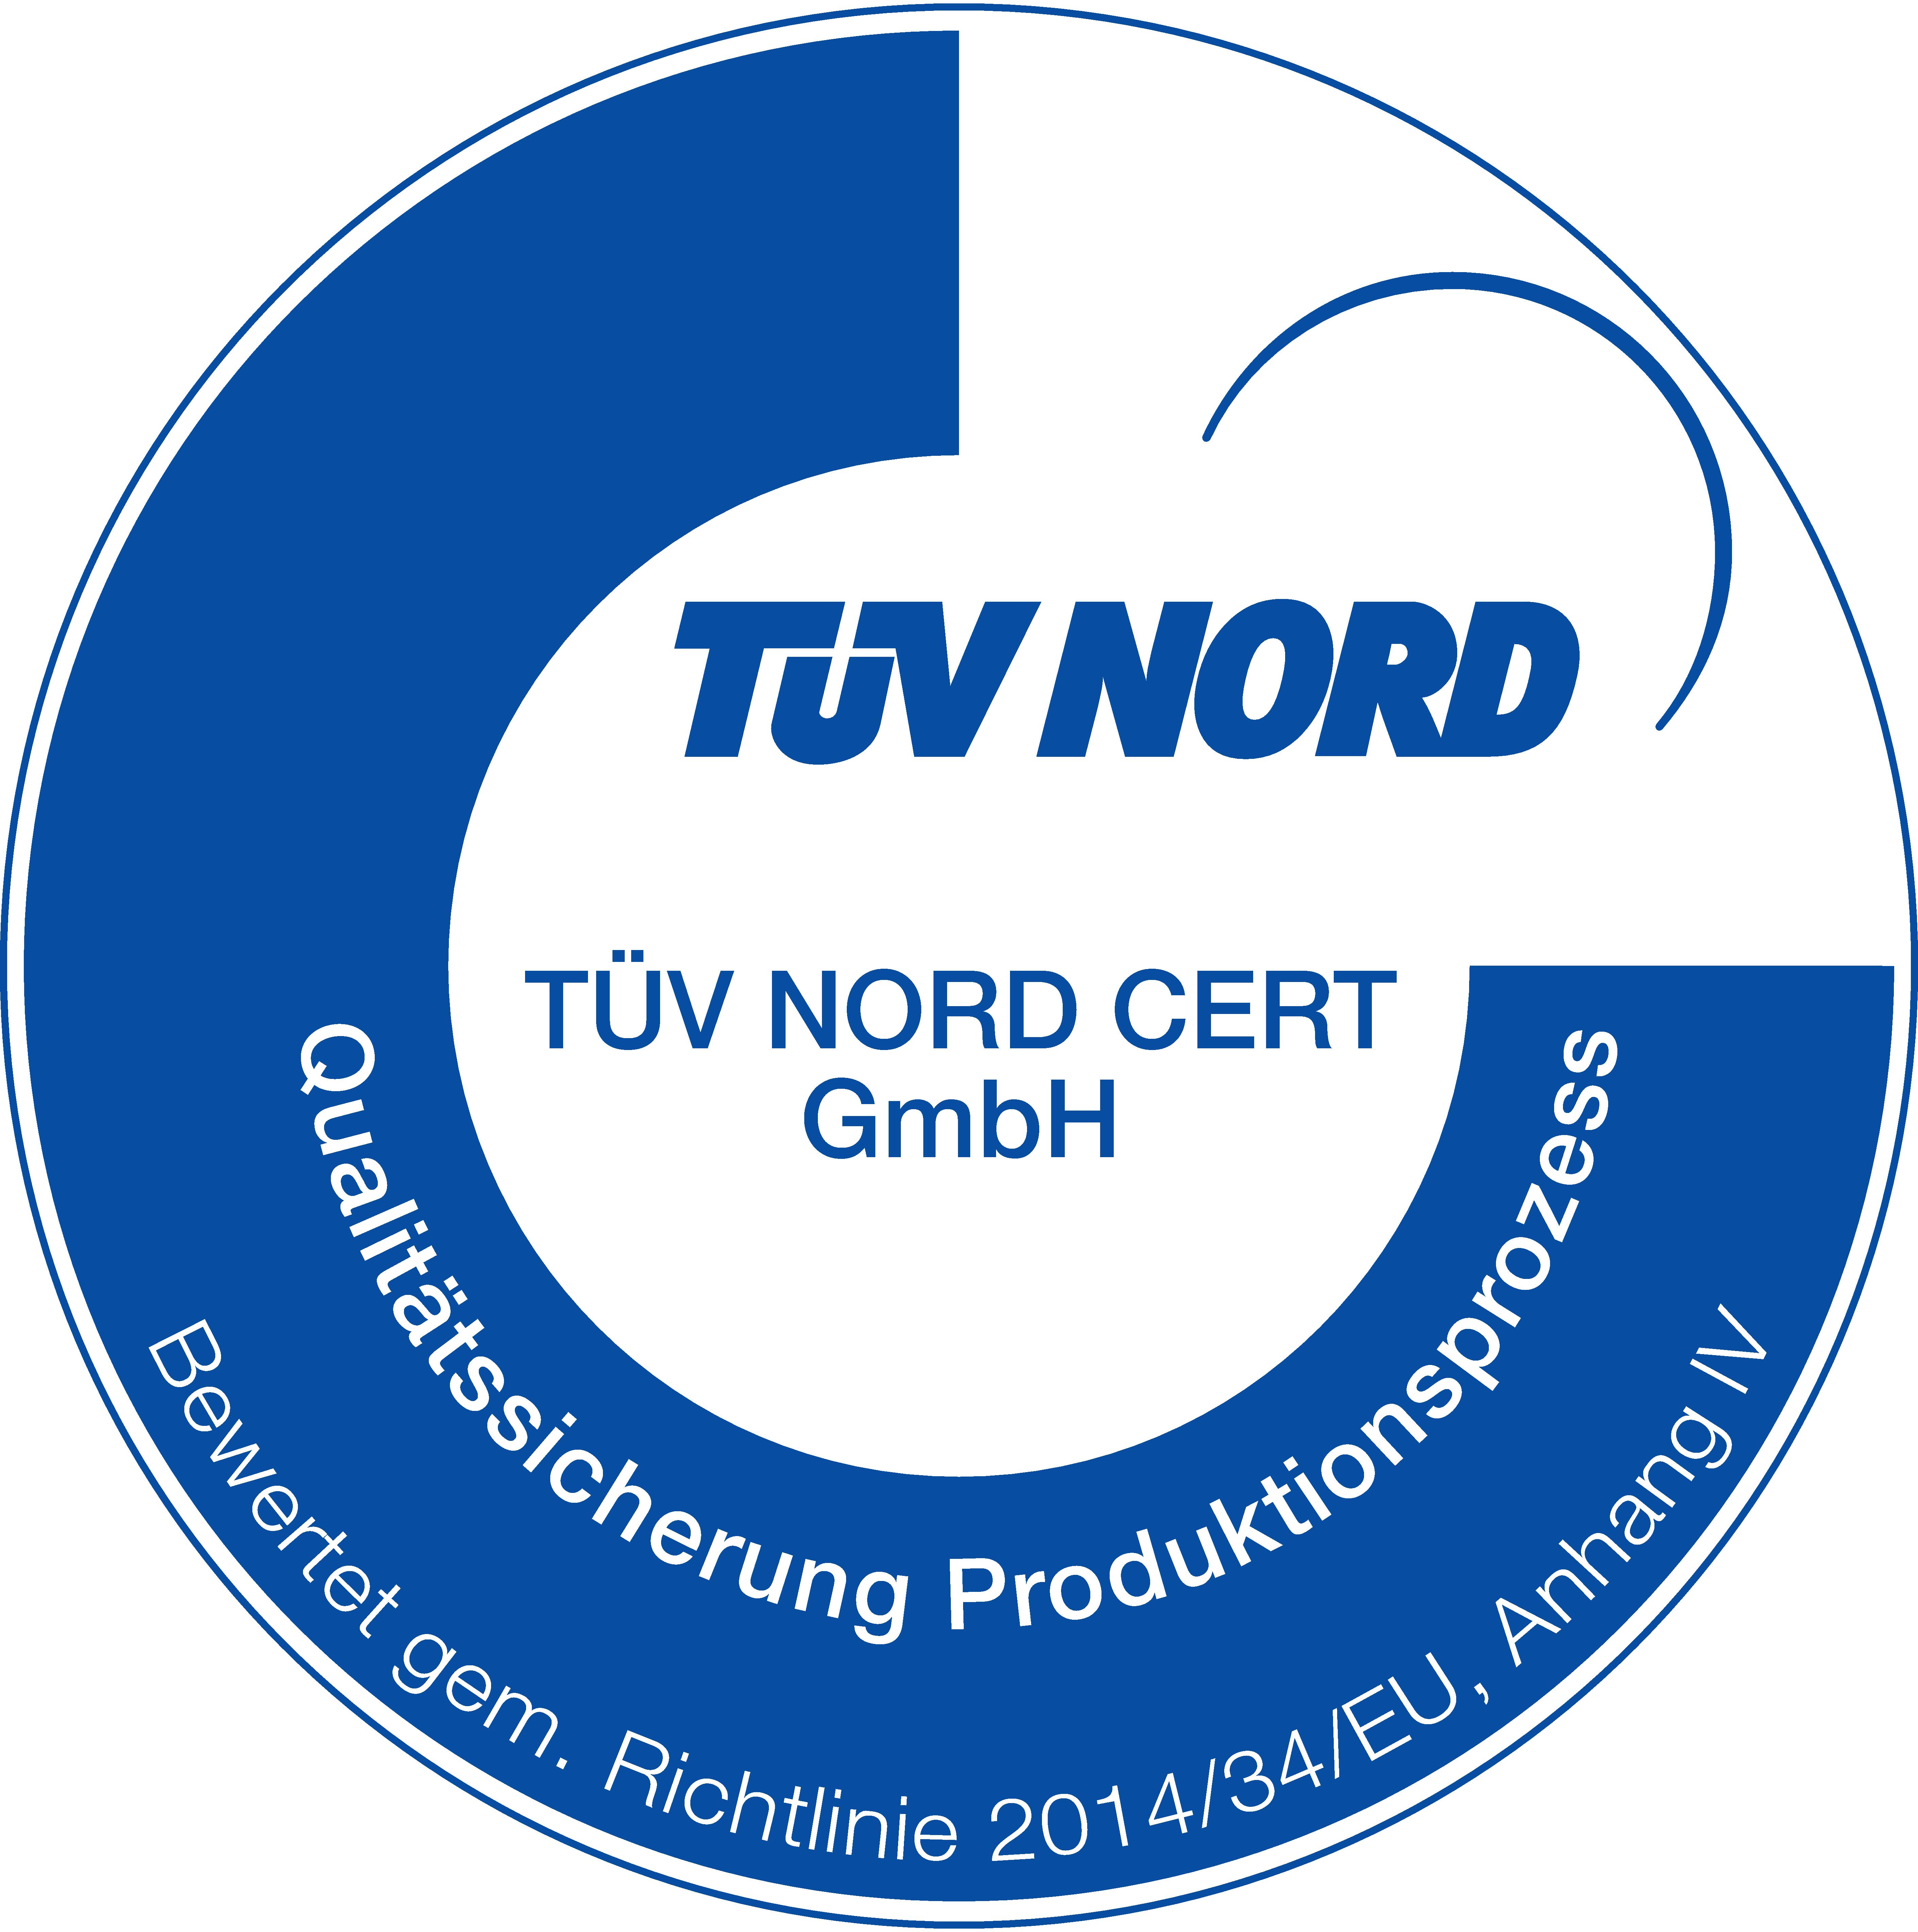 TÜV NORD CERT GmbH